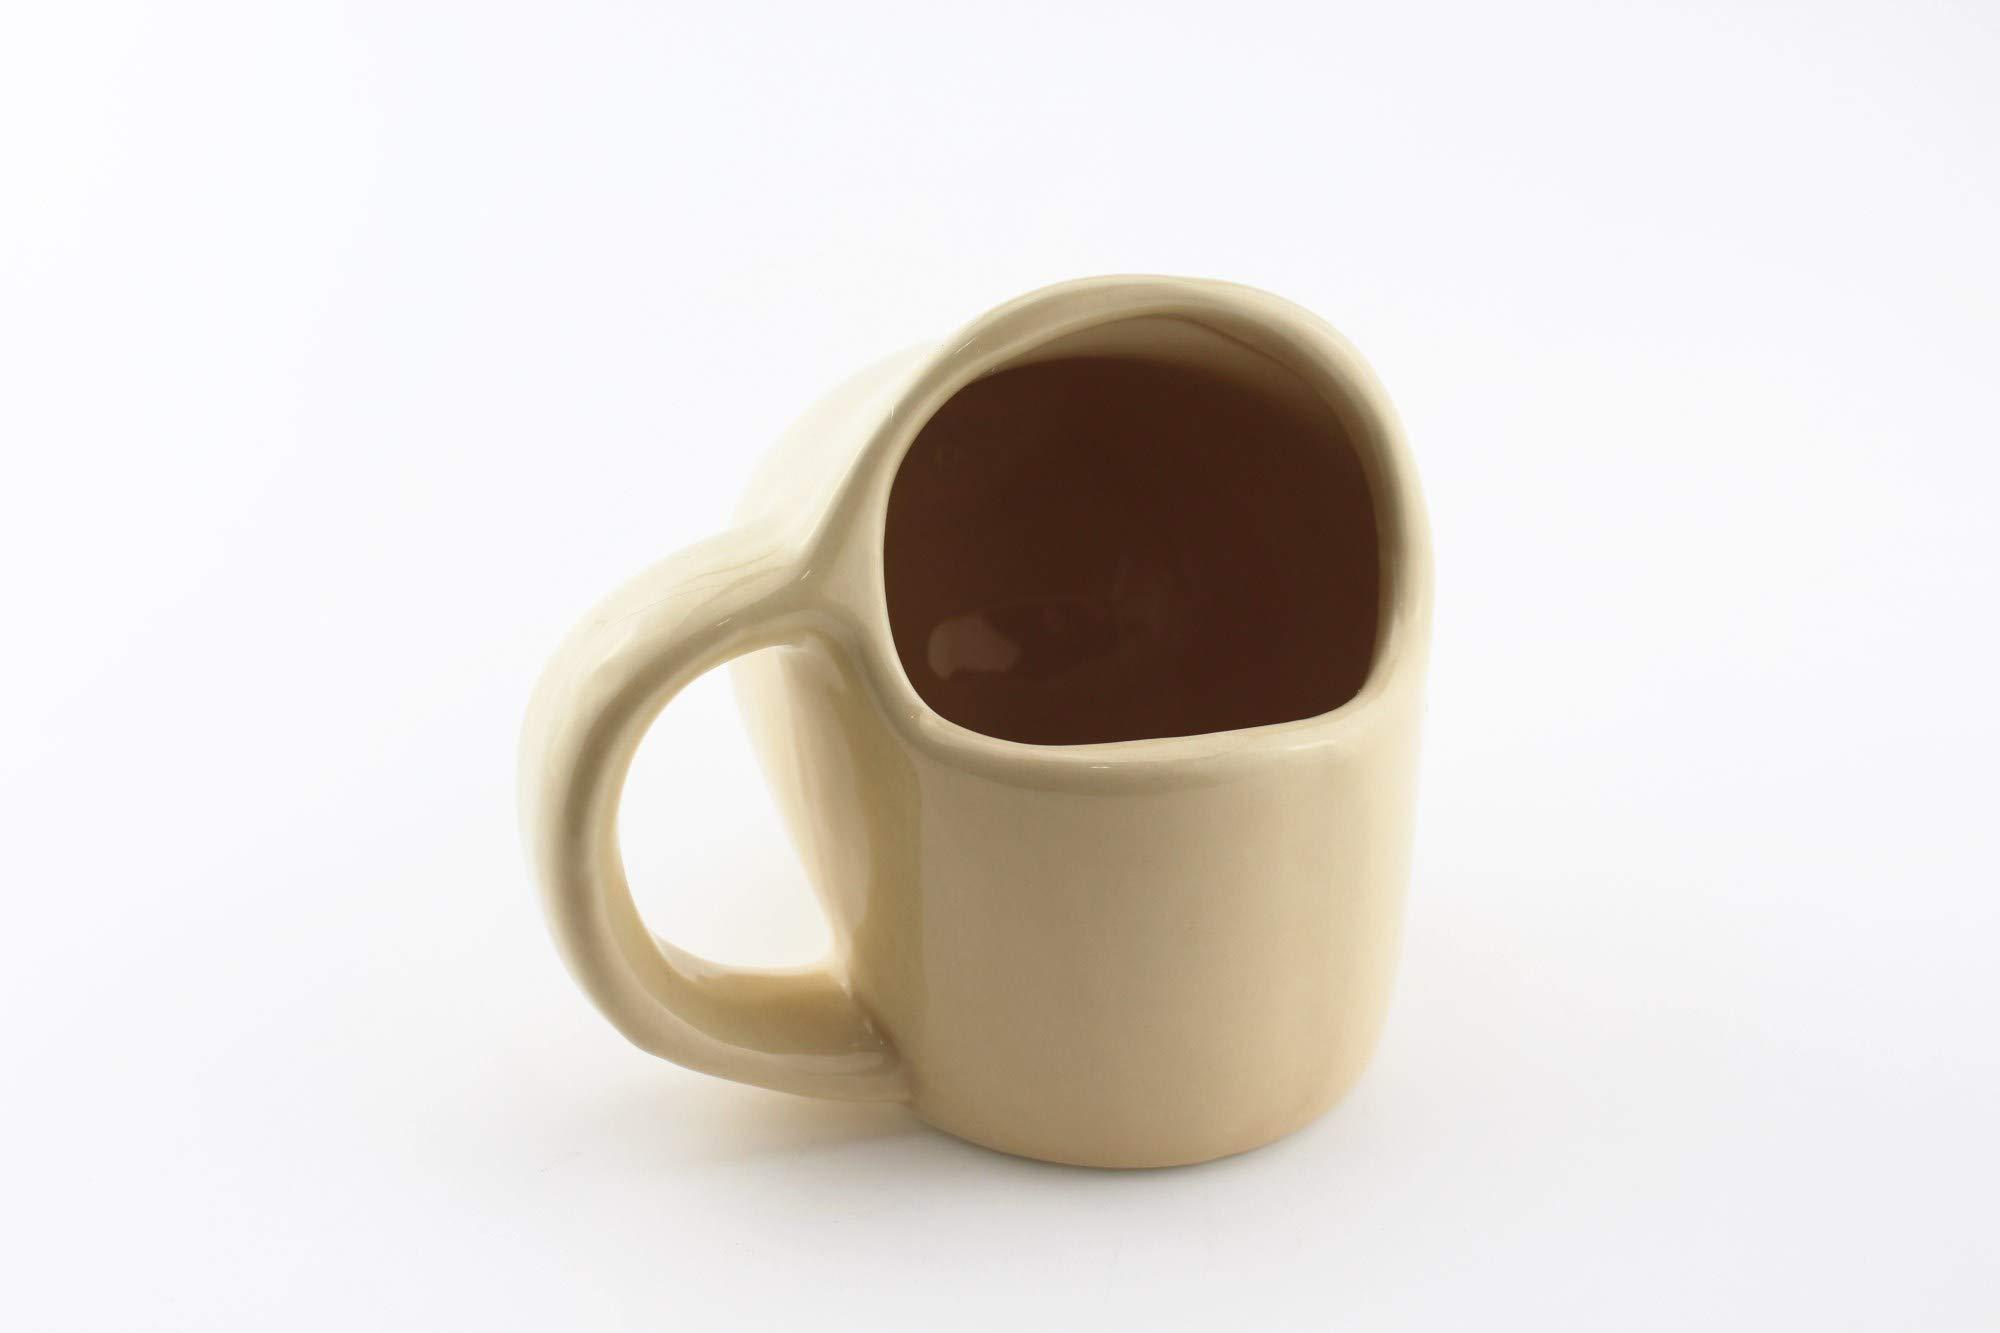 Boobie Boobs Mug Ceramic Coffee Cup Water Juice Cups (Boobs) by Est LLC (Image #4)